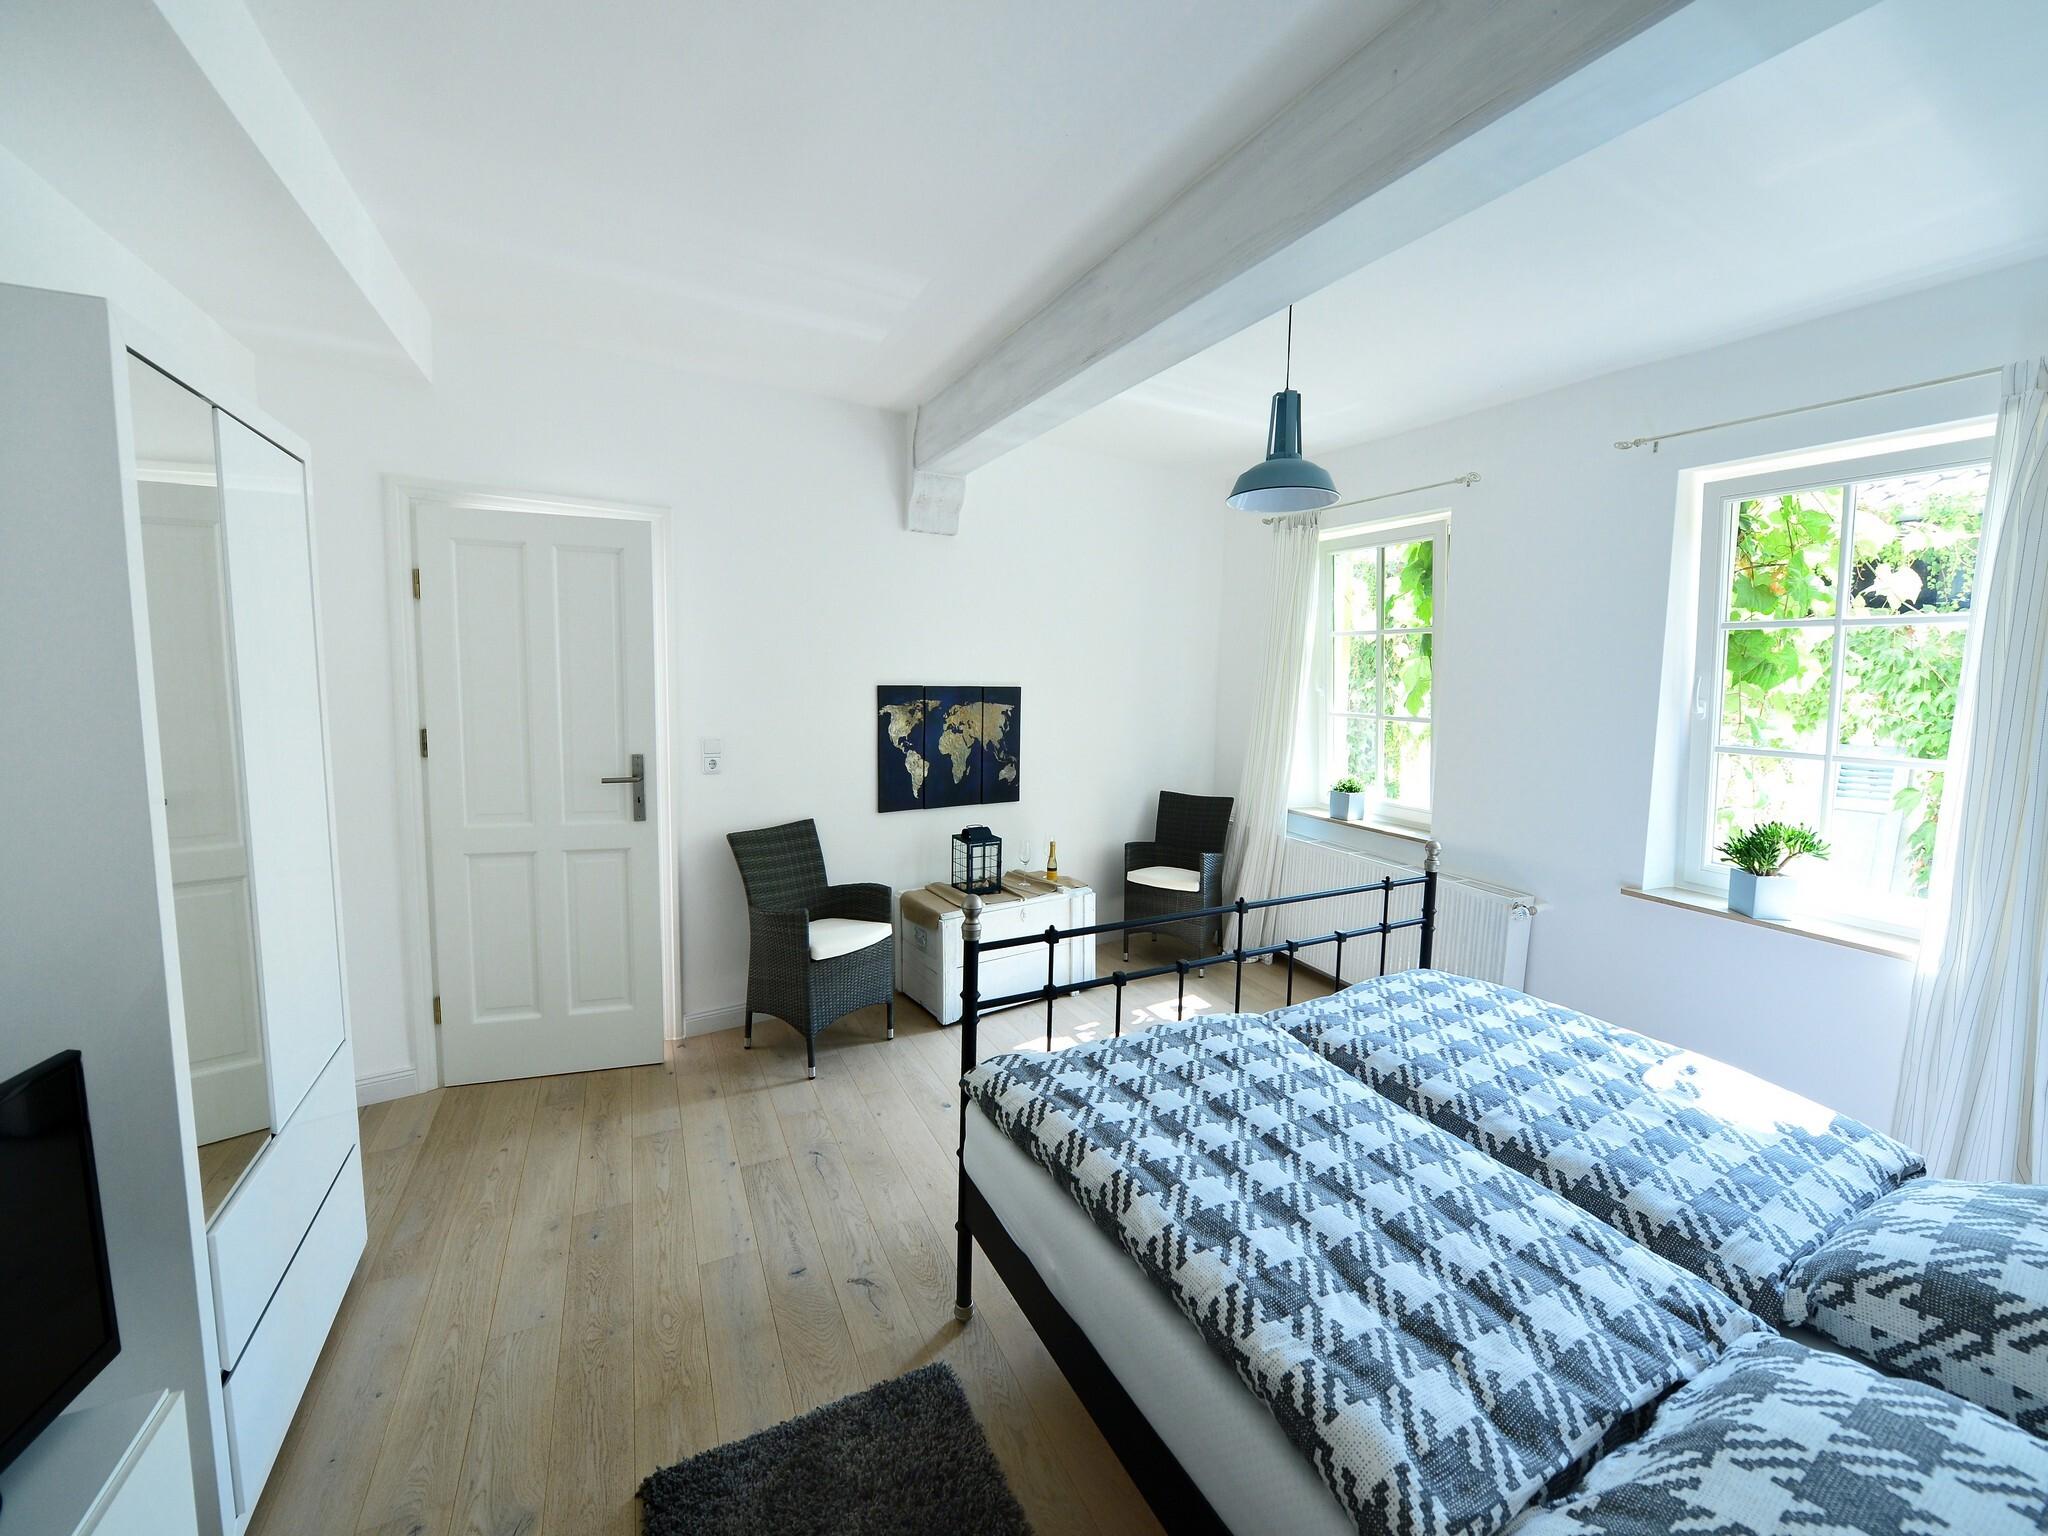 Doppelzimmer-Komfort-Ensuite Dusche - Basistarif